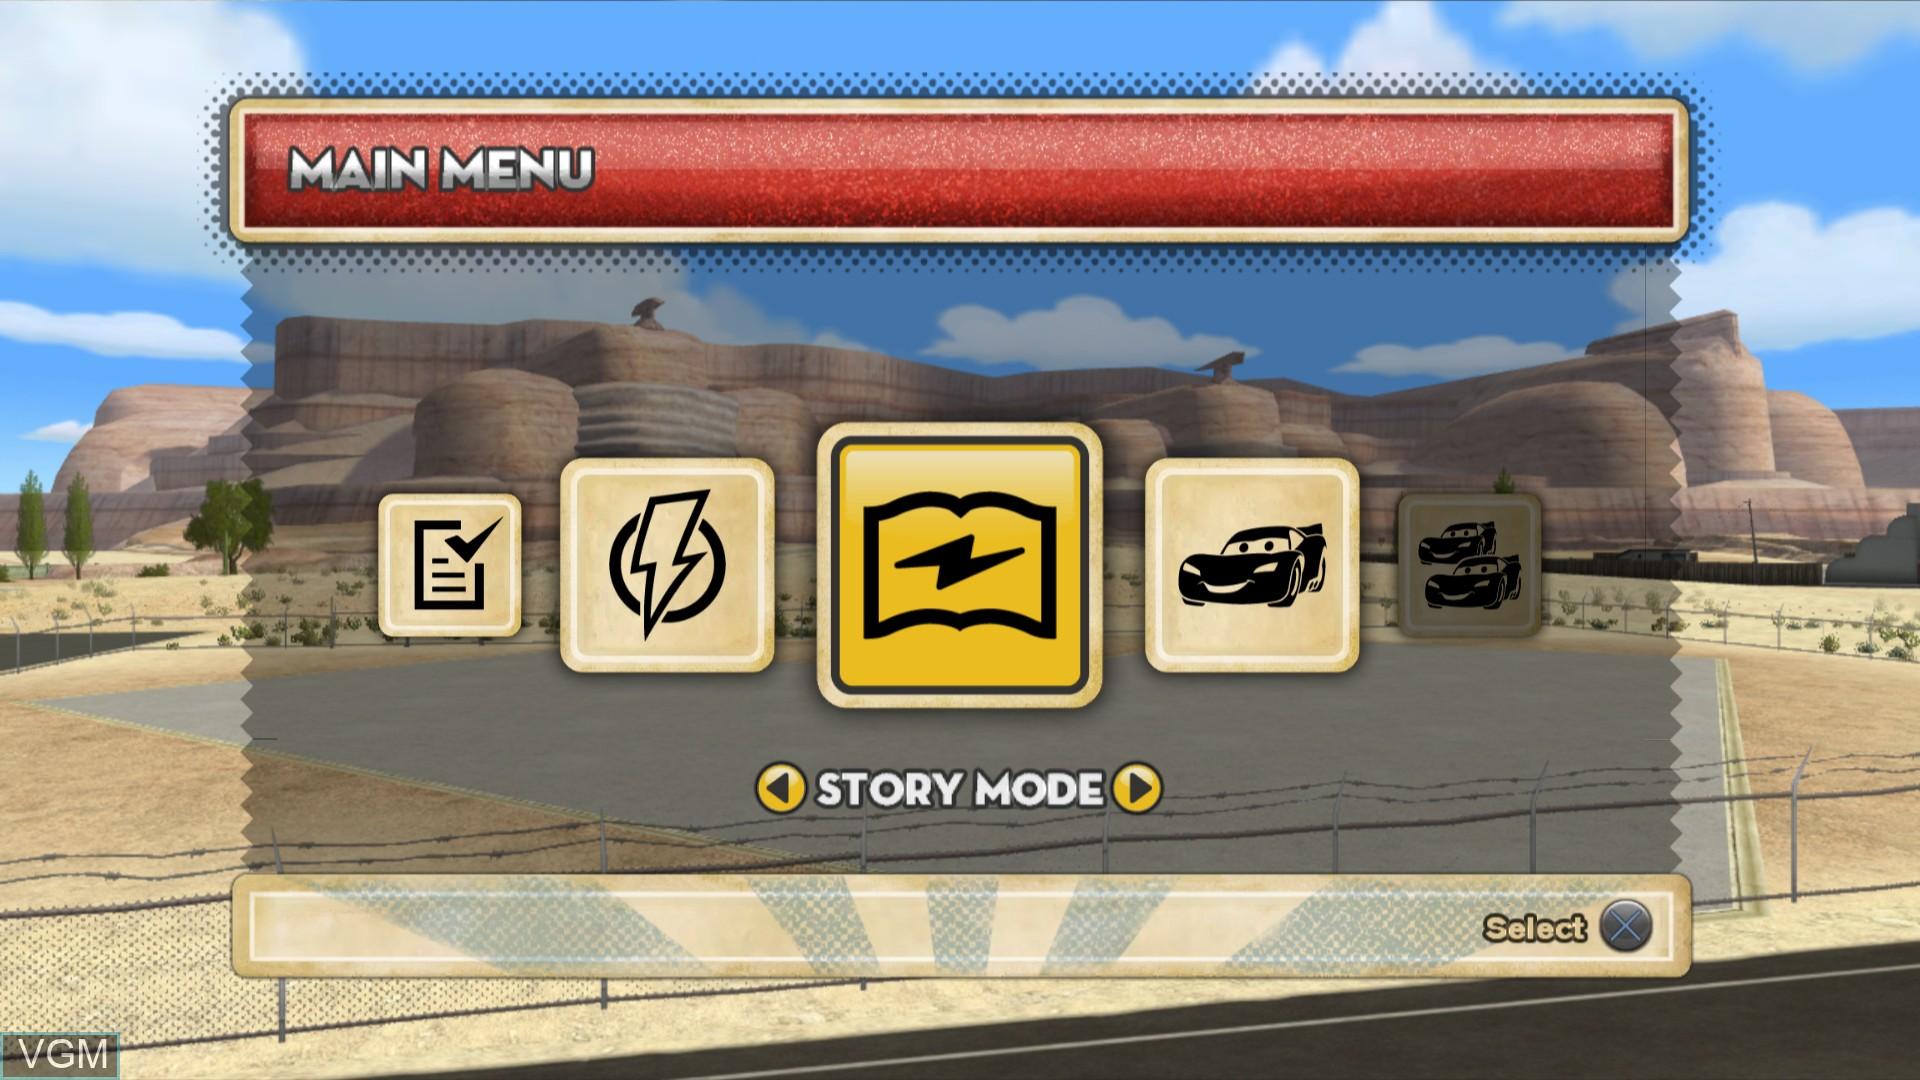 Image du menu du jeu Cars Mater-National Championship sur Sony Playstation 3